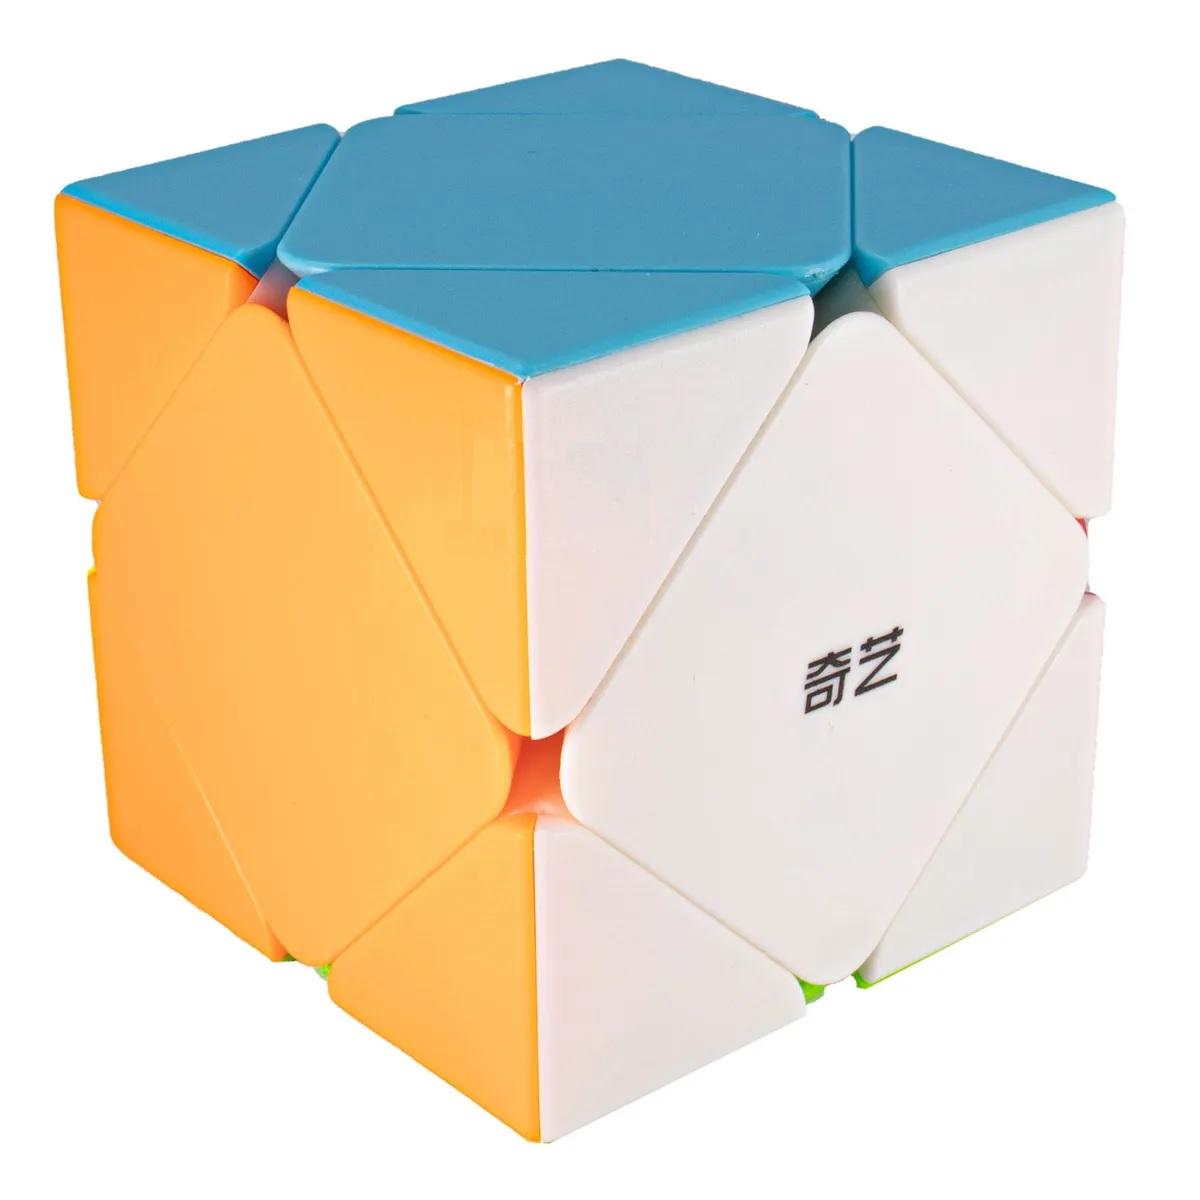 Cubo Mágico Profissional Skewb Qiyi QiCheng Colorido - Qiyi-Mfg